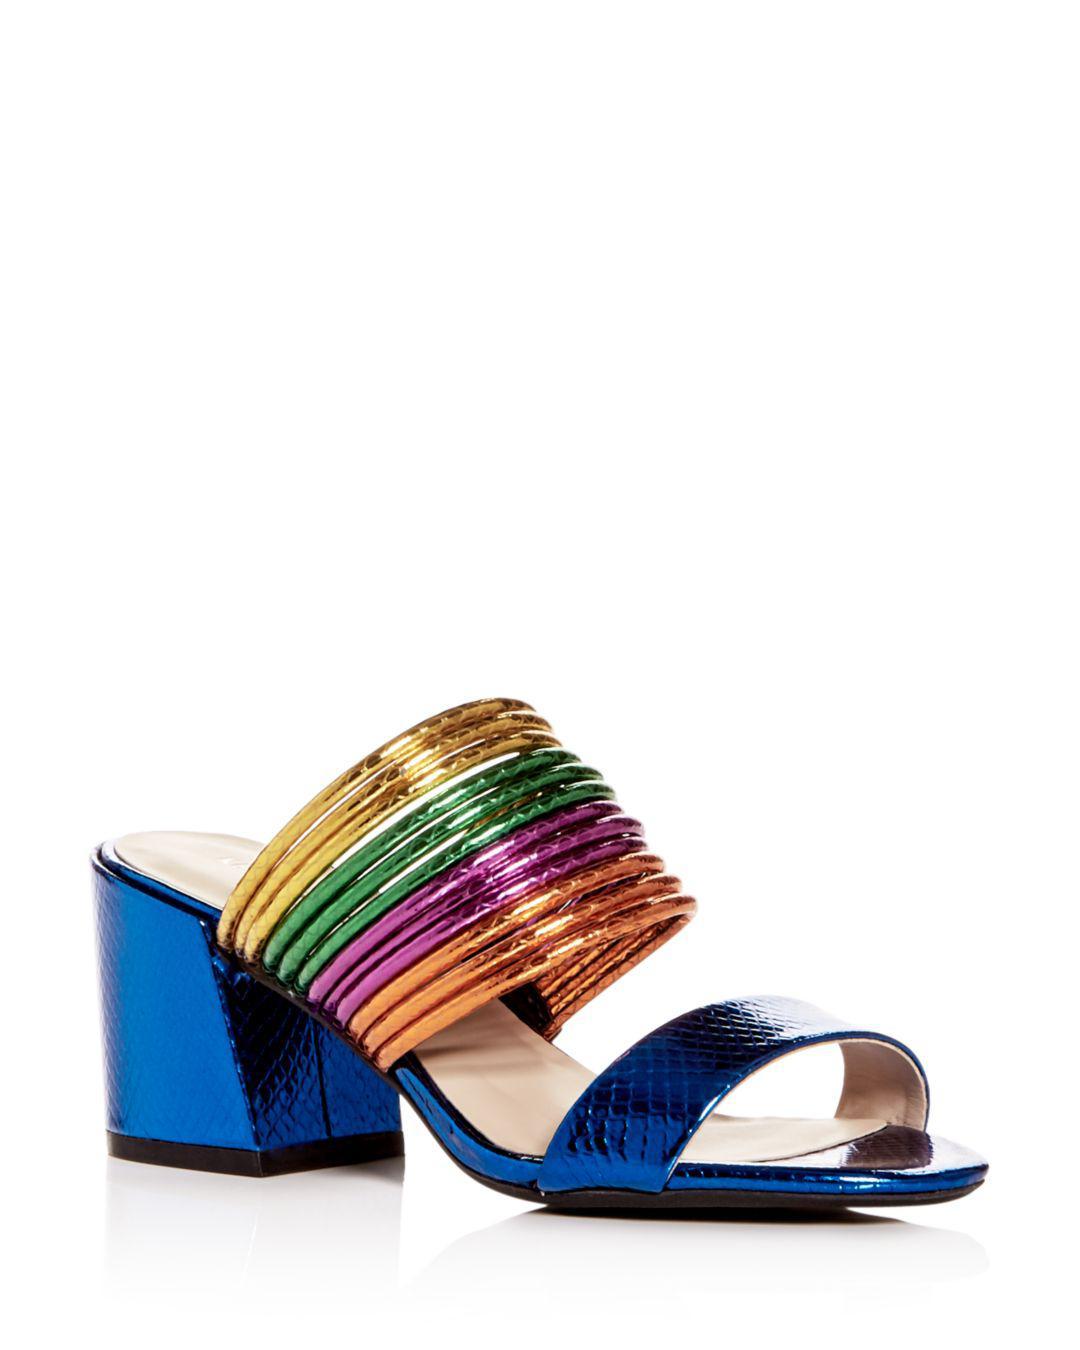 01ccb89cfe9 Lyst - Kenneth Cole Women s Hanna Block-heel Sandals in Blue